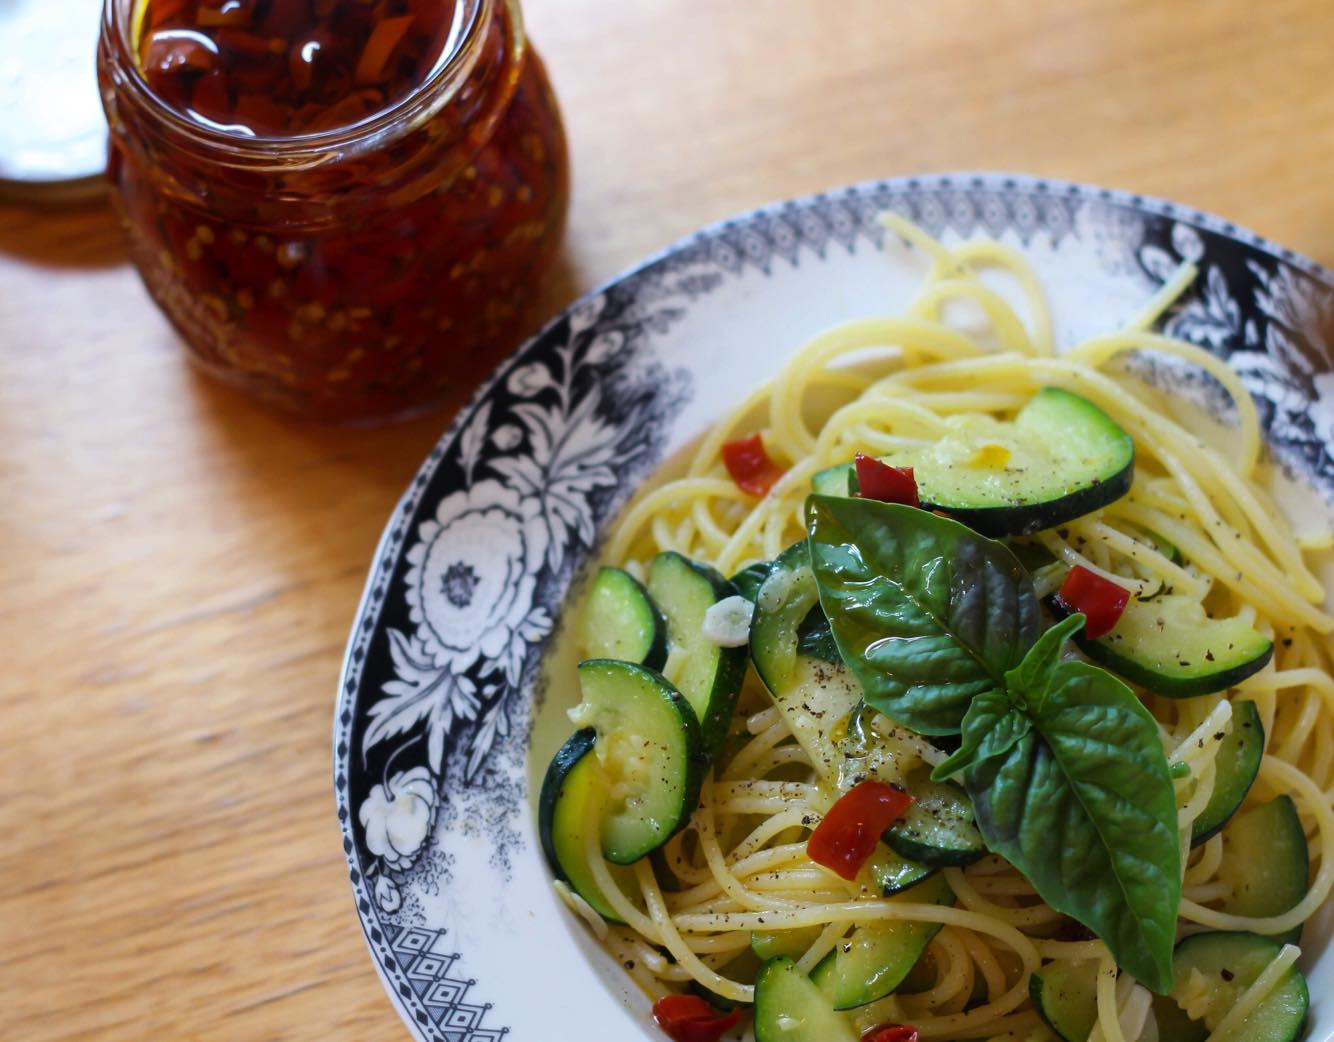 Garlicky Zucchini Spaghetti